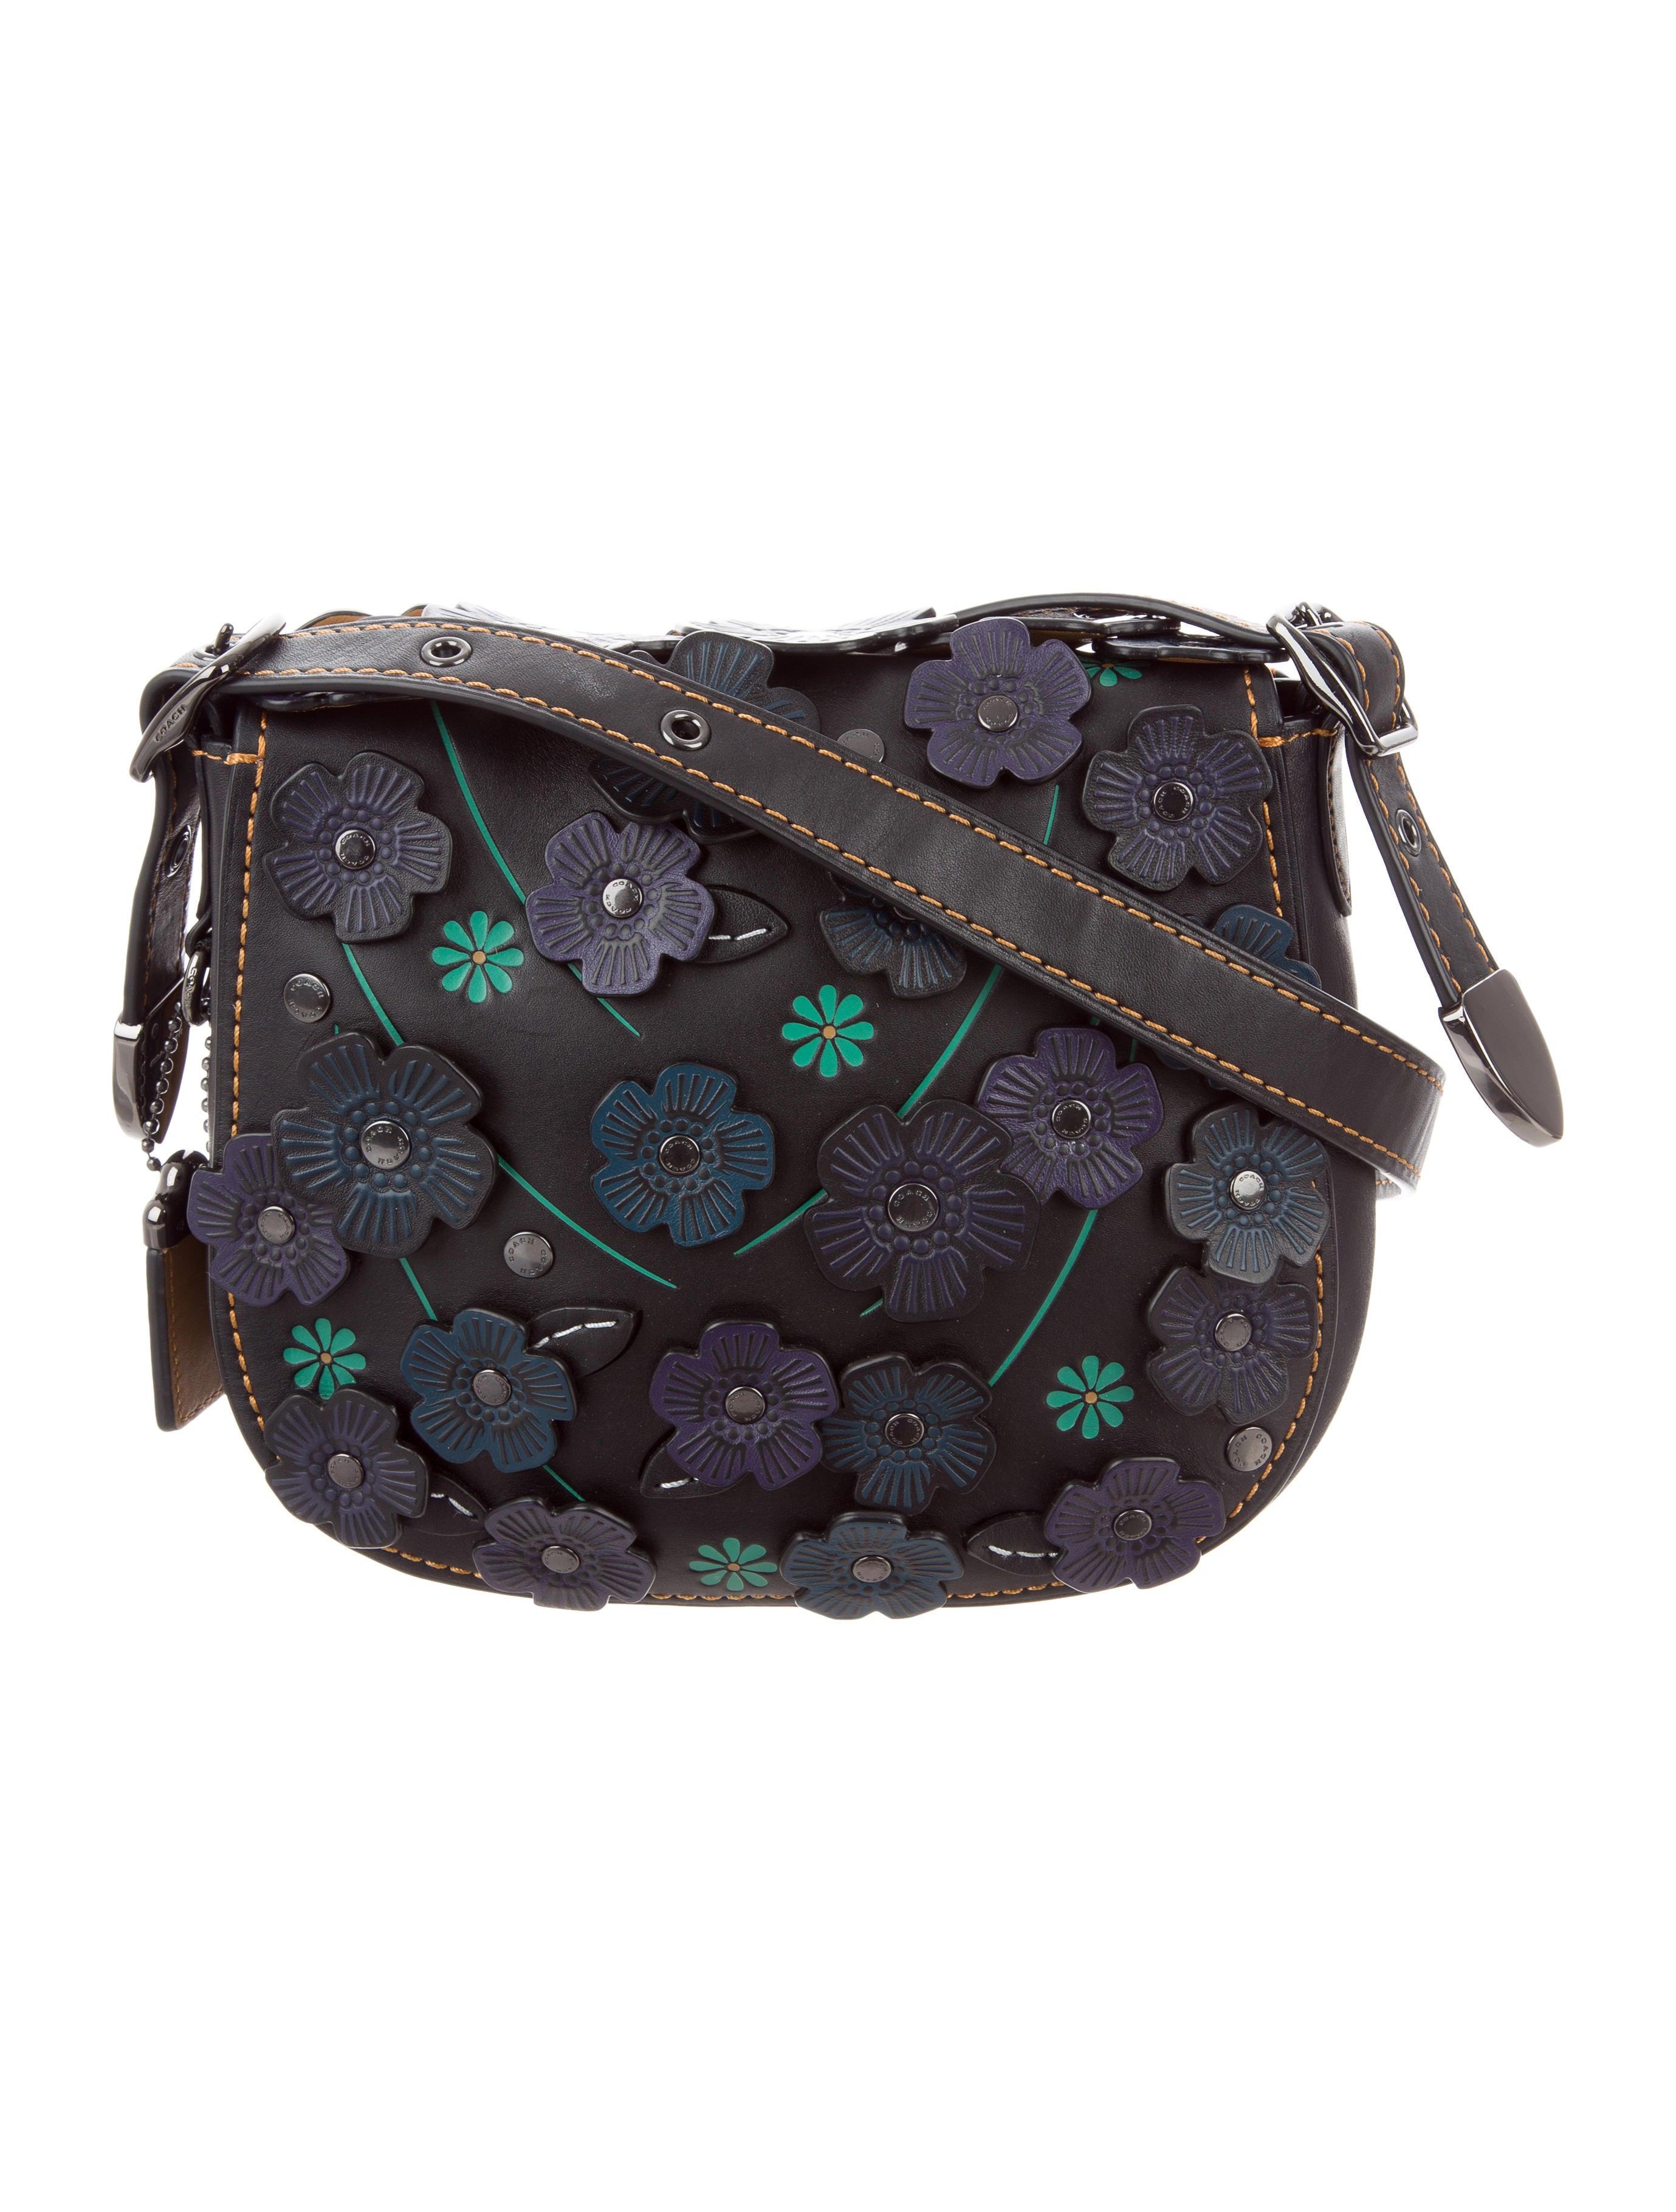 Coach 1941 Saddle 23 Bag Handbags Chnfo20106 The